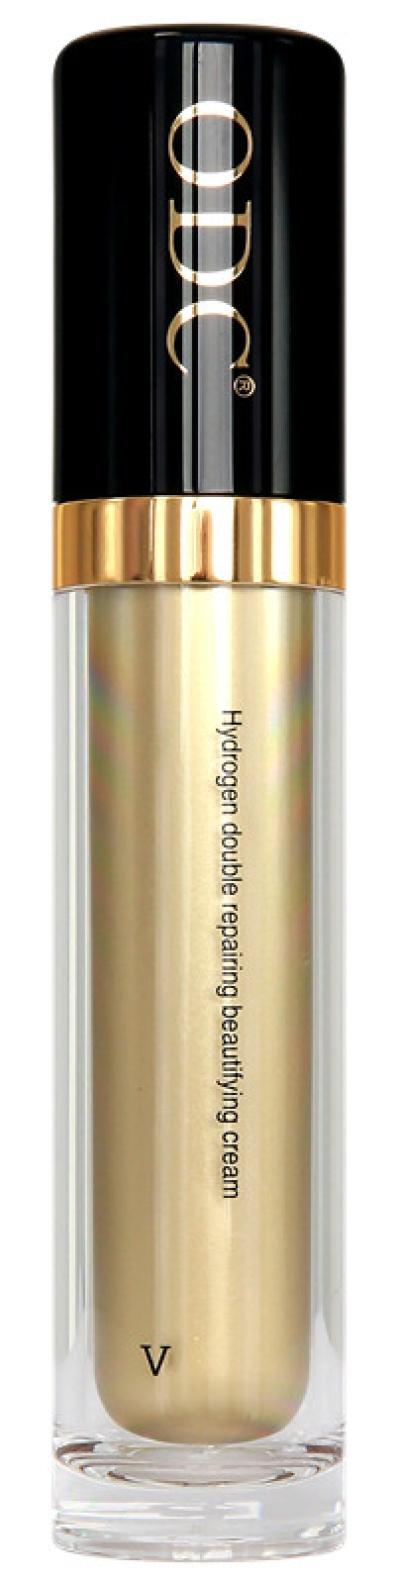 [F5]氢奢双重修护美容霜 V